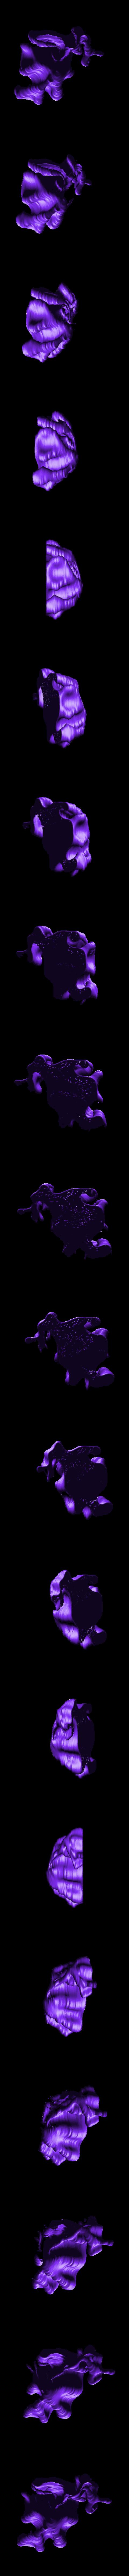 dragoncoral3.stl Download free STL file Weird terrain collection • 3D printer object, ferjerez3d